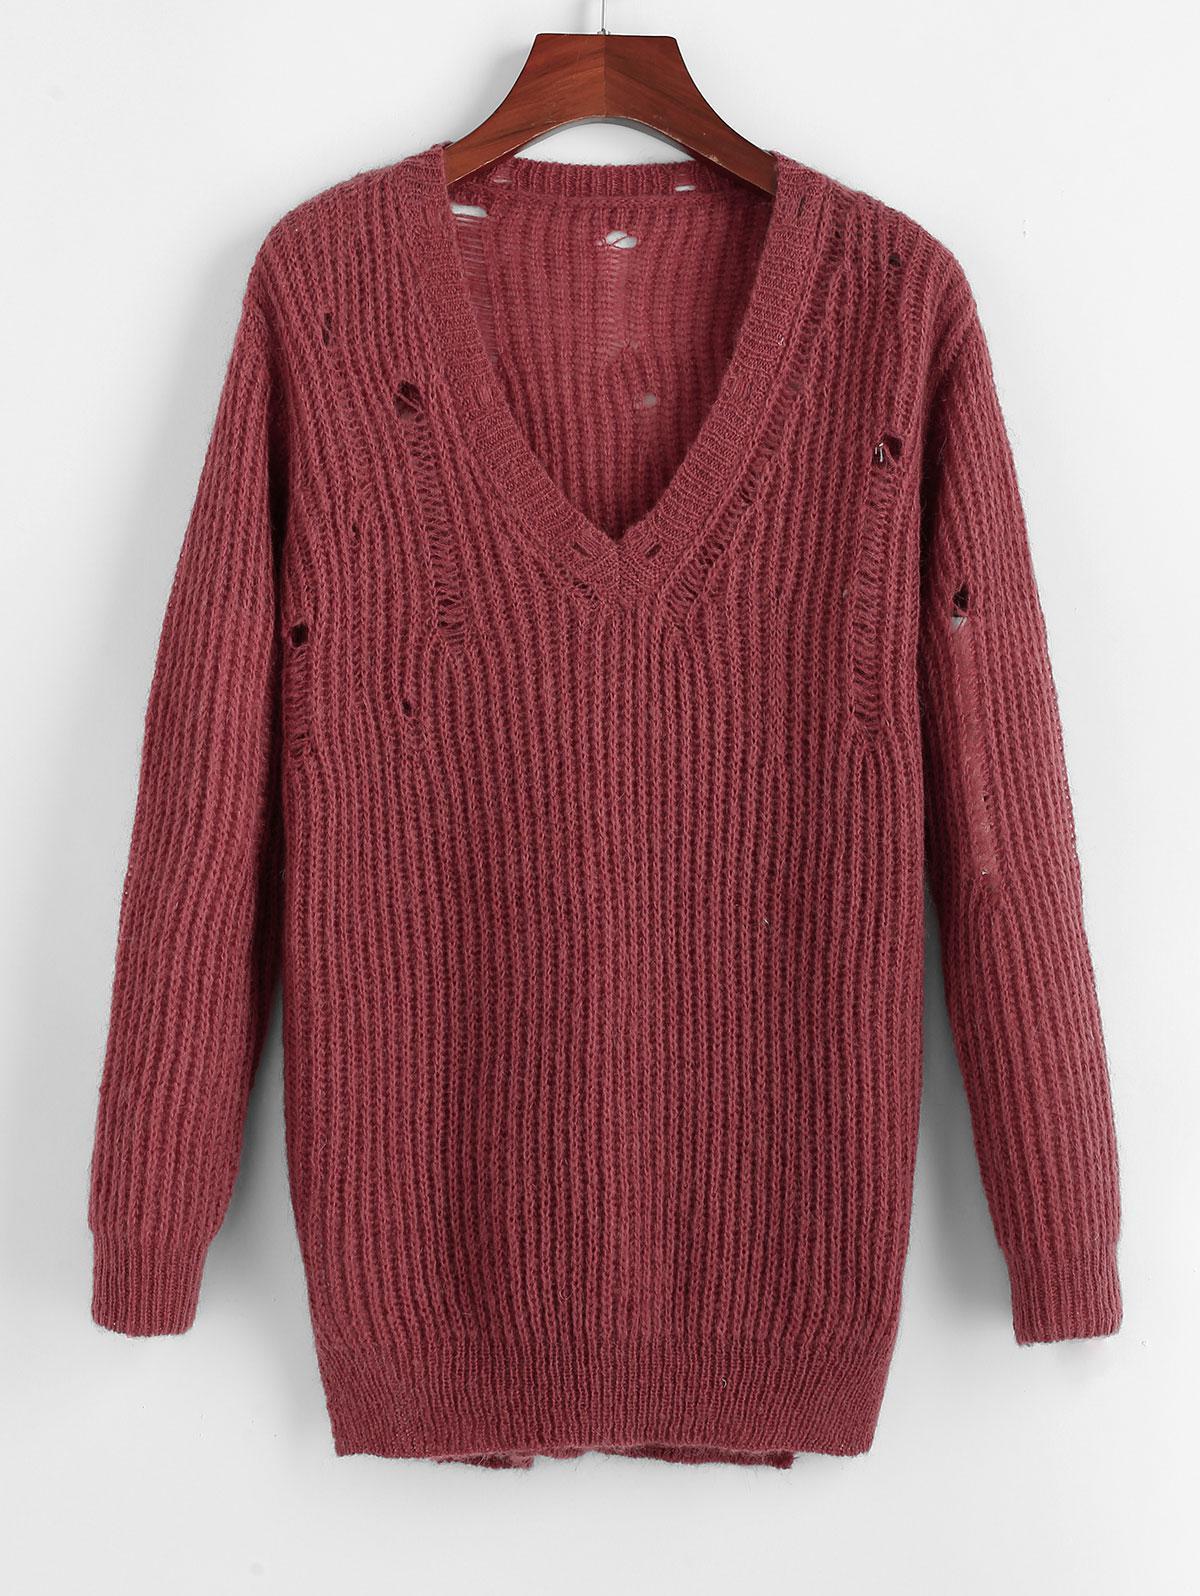 ZAFUL Ripped Plunge Textured Plain Sweater